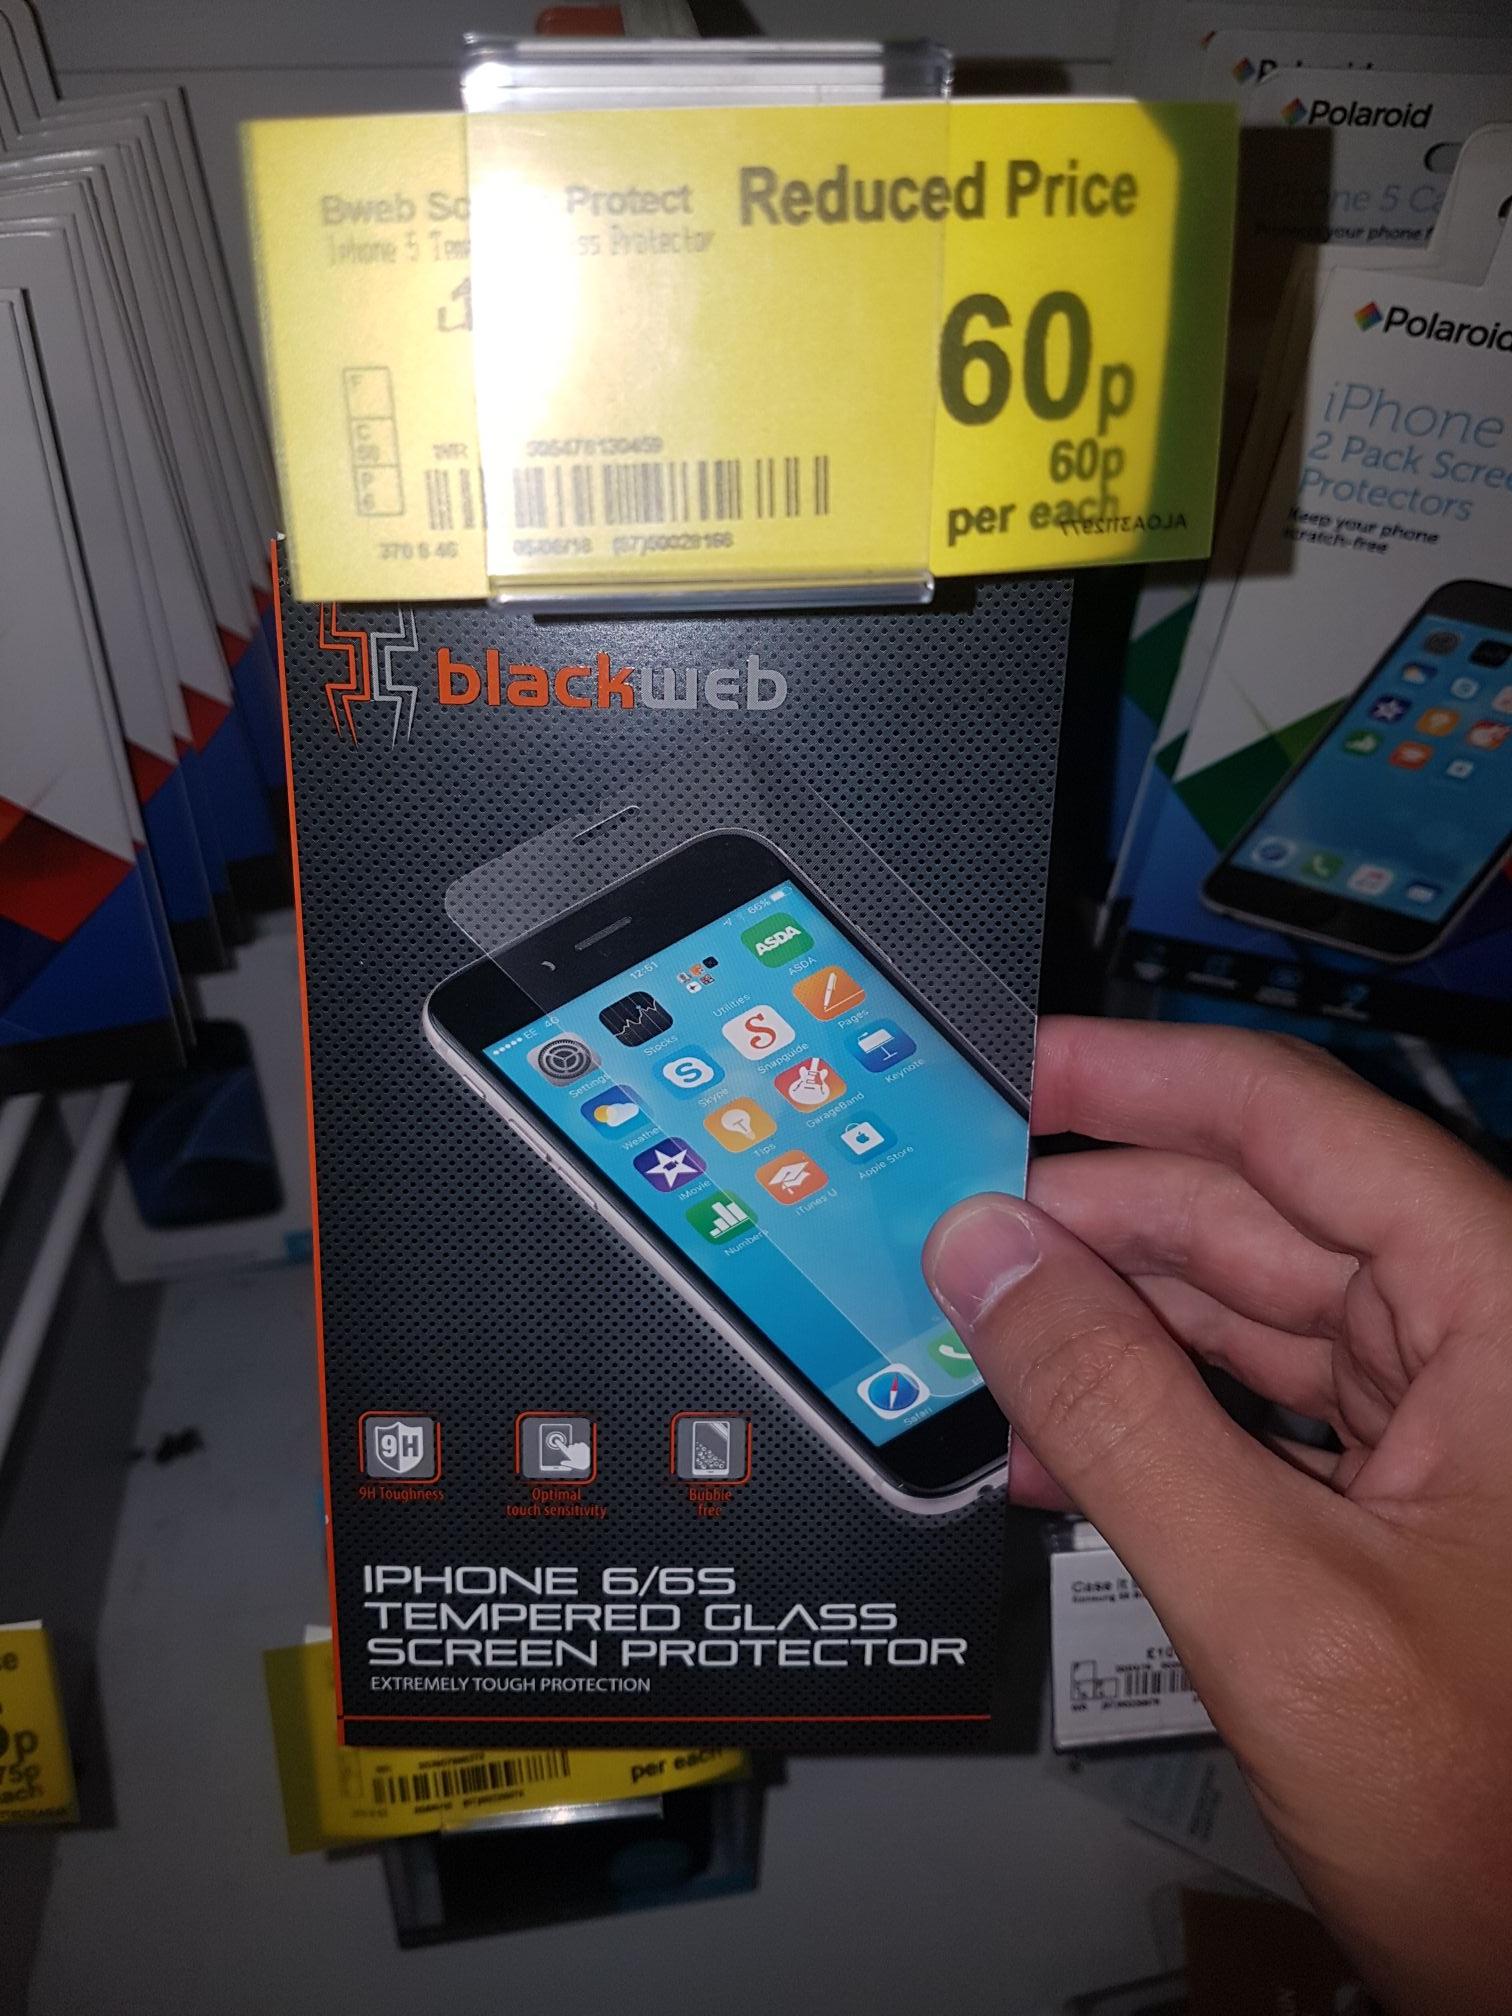 Blackweb screen protector iPhone 6s 60p @ asda instore